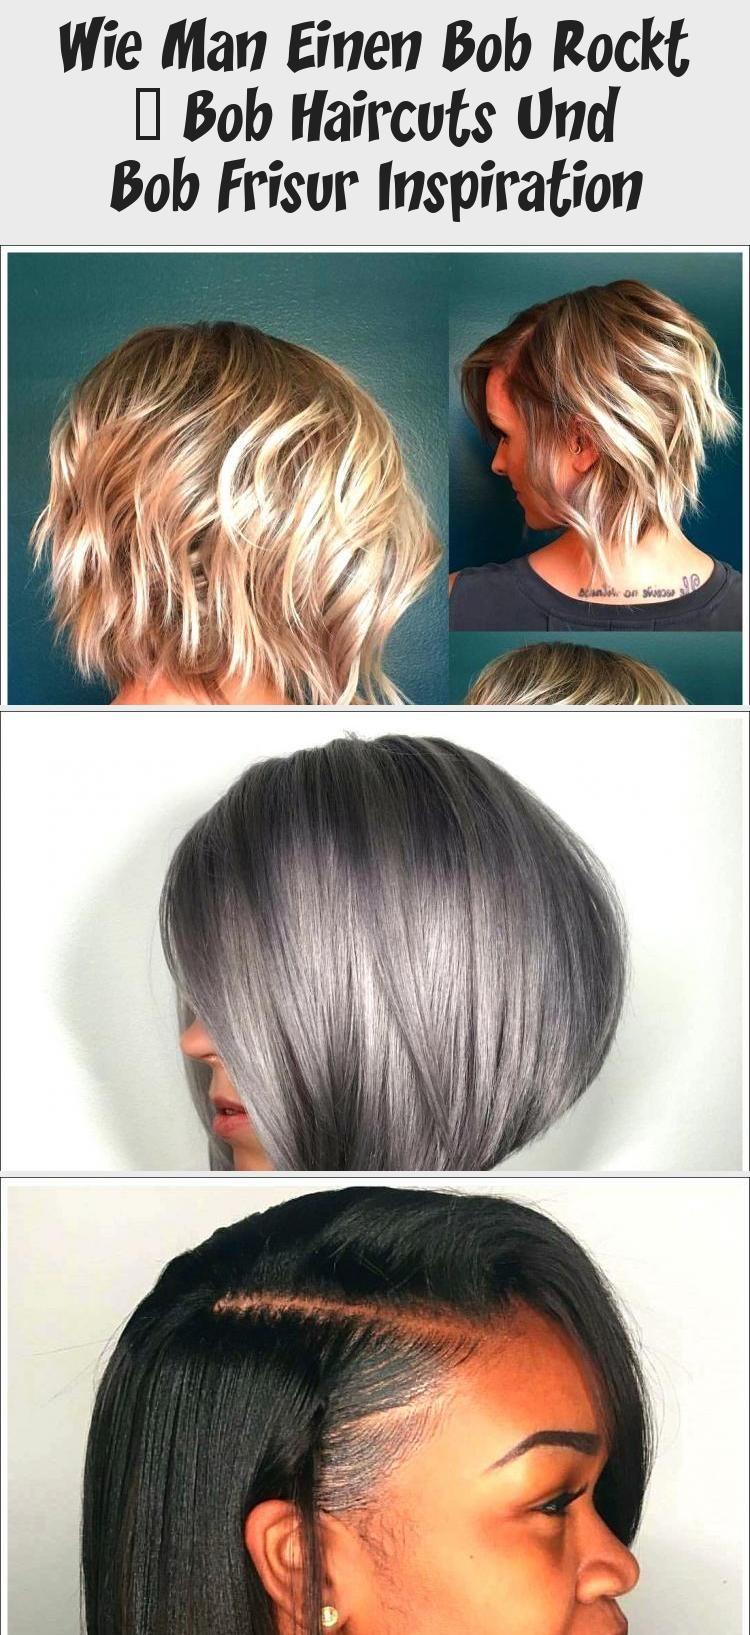 Wie Man Einen Bob Rockt Bob Haircuts Und Bob Frisur Inspiration